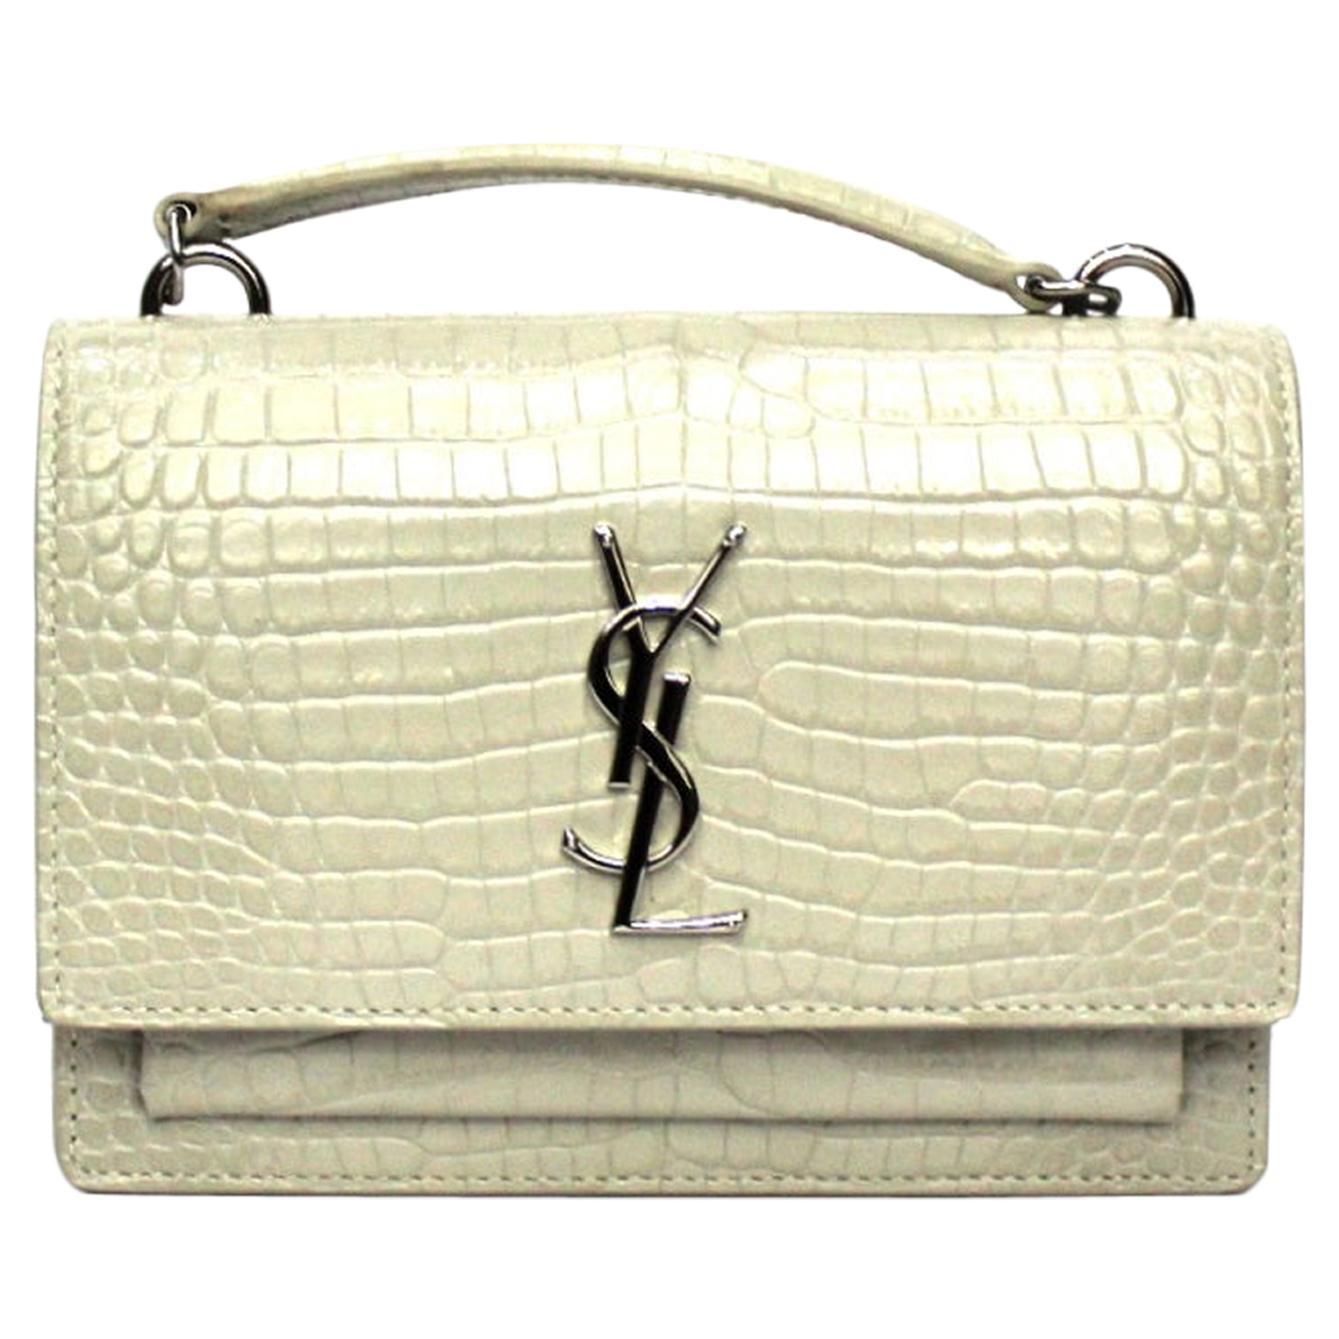 Saint Laurent White Leather Sunset Bag